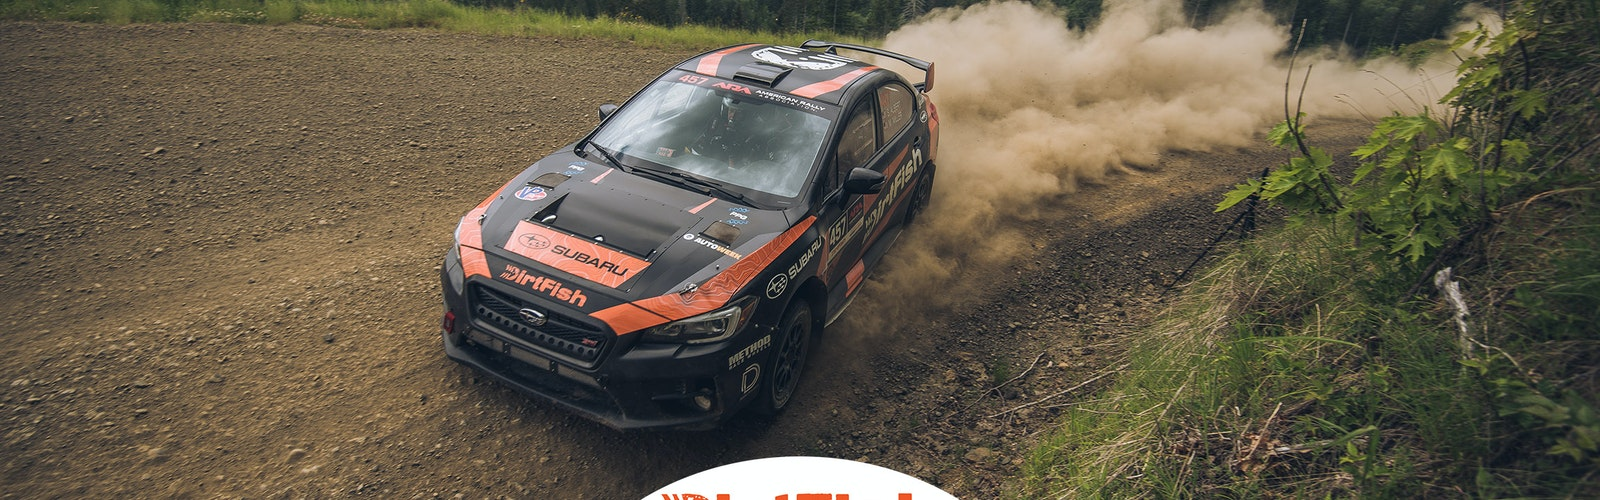 DirtFish-Olympus-Rally-2019-2